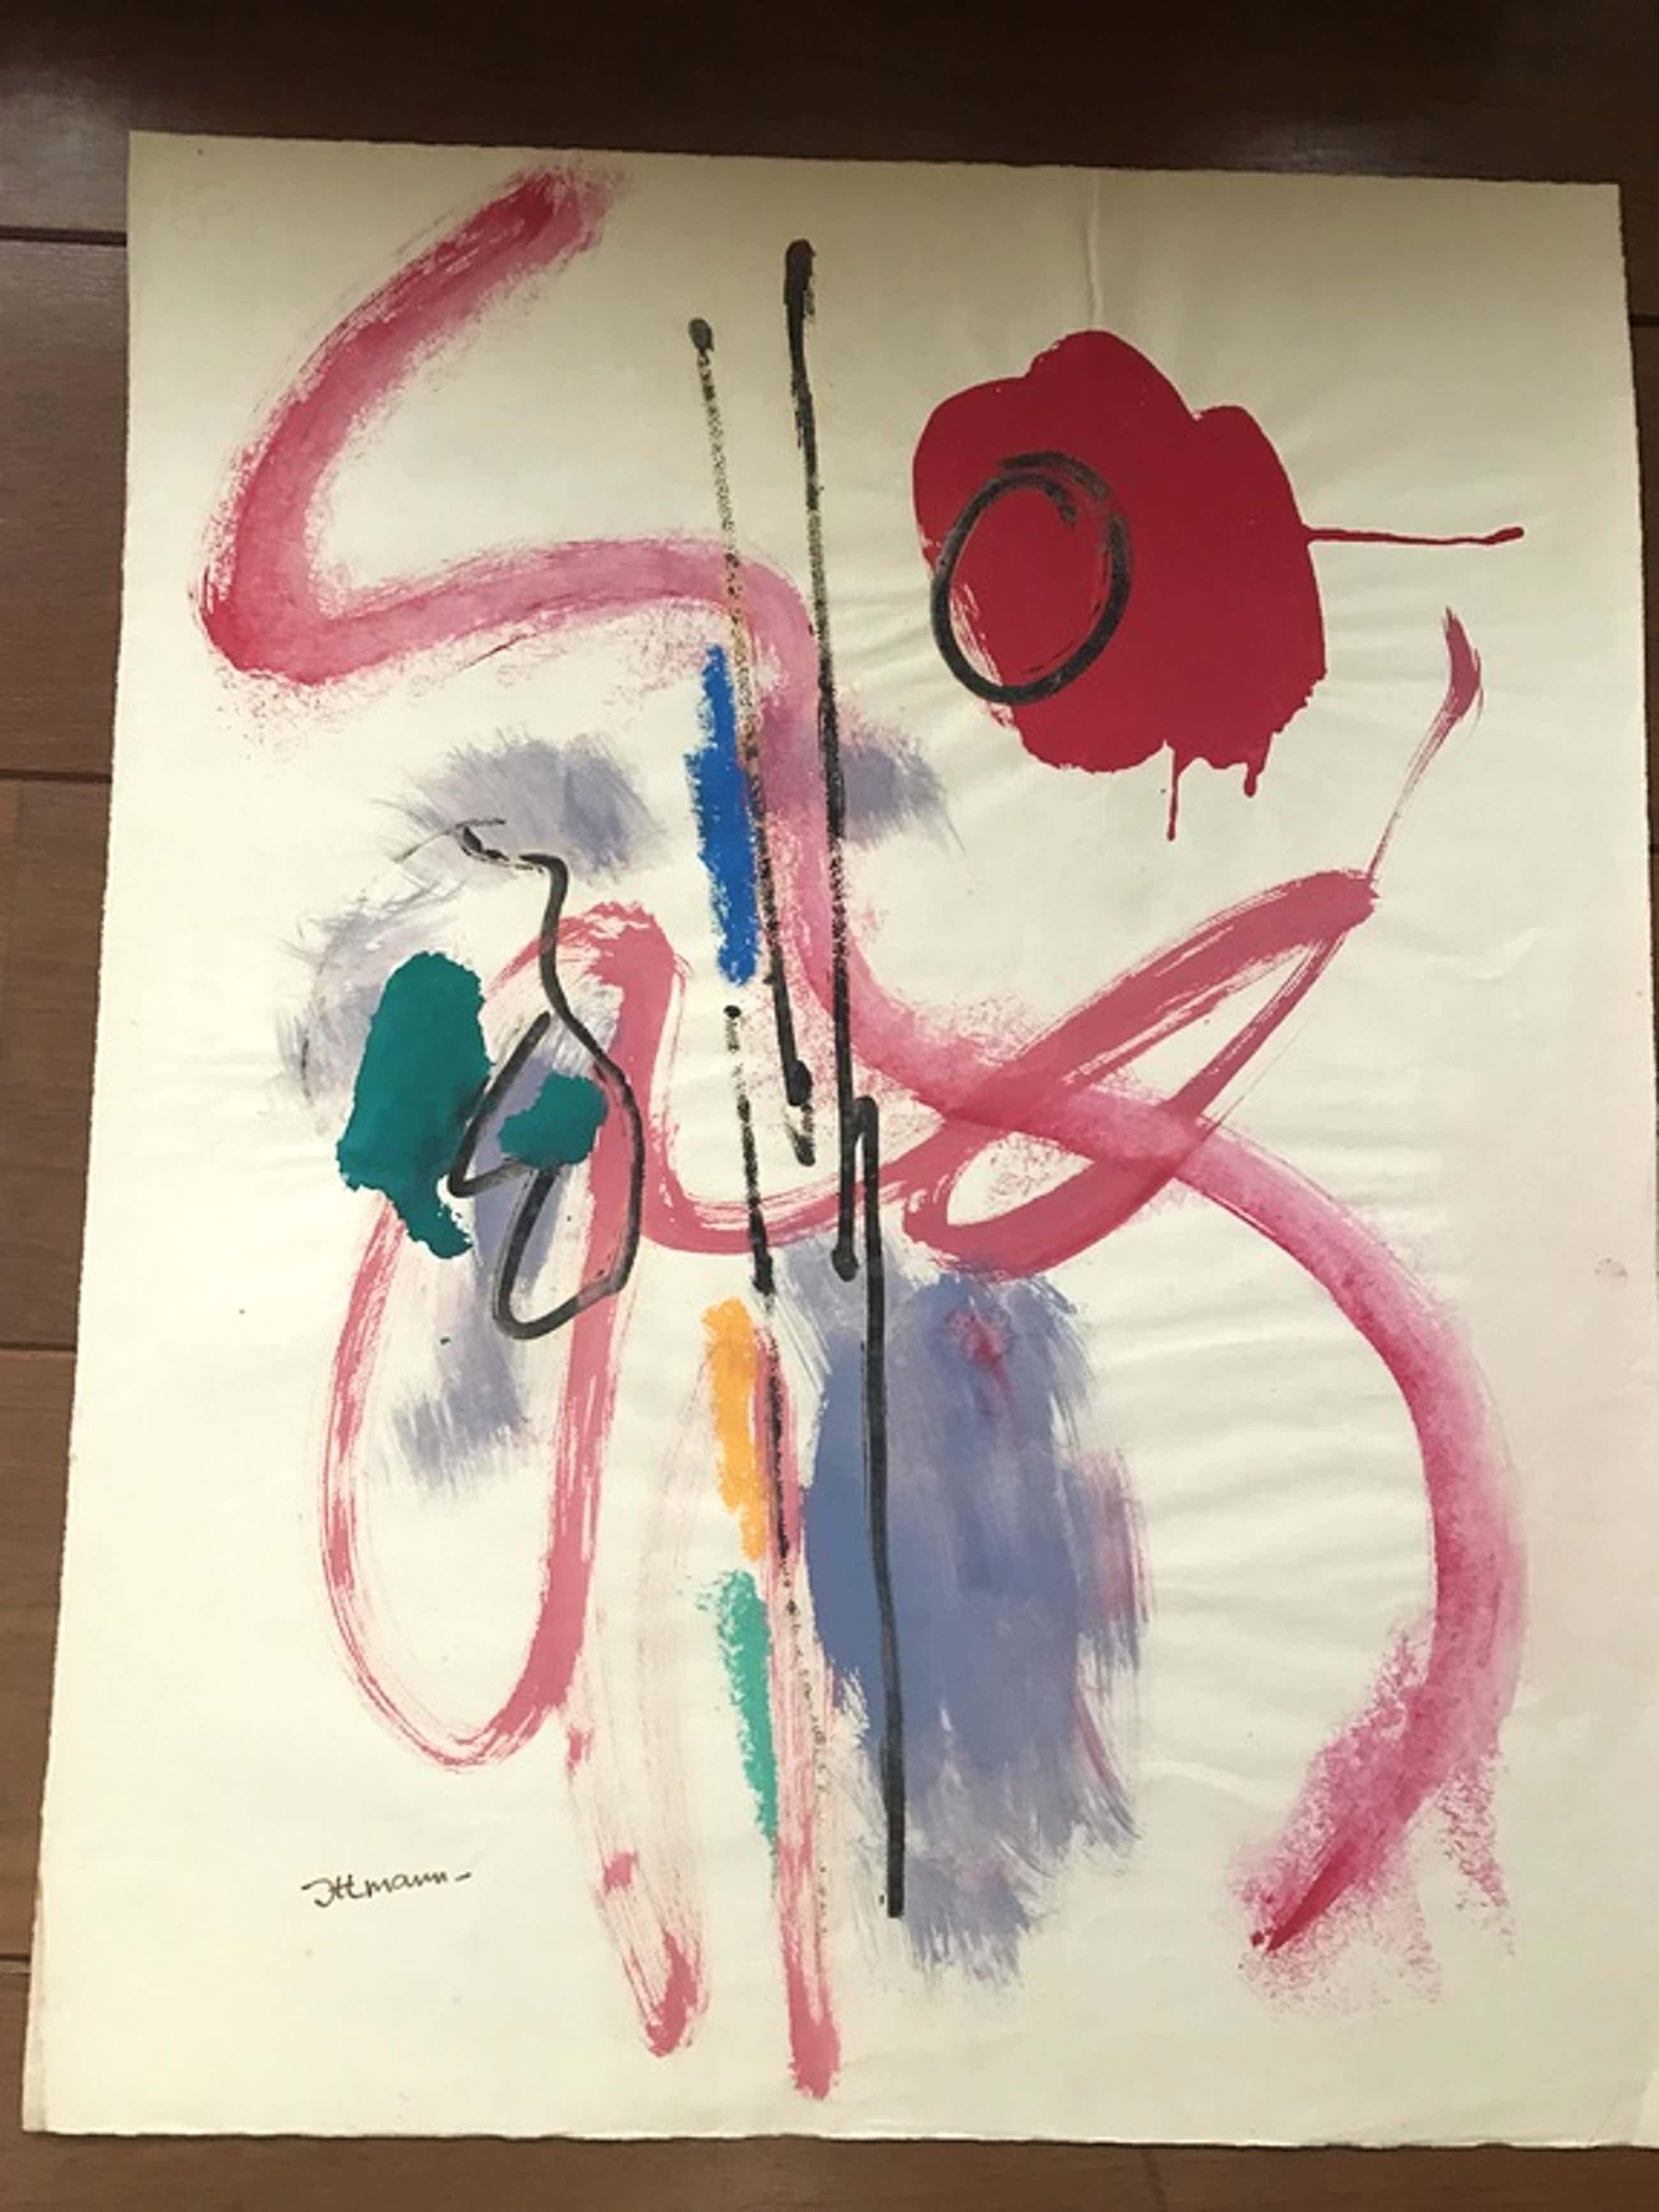 Hans ittmann apuarel moderne compositie kopen? Bied vanaf 65!